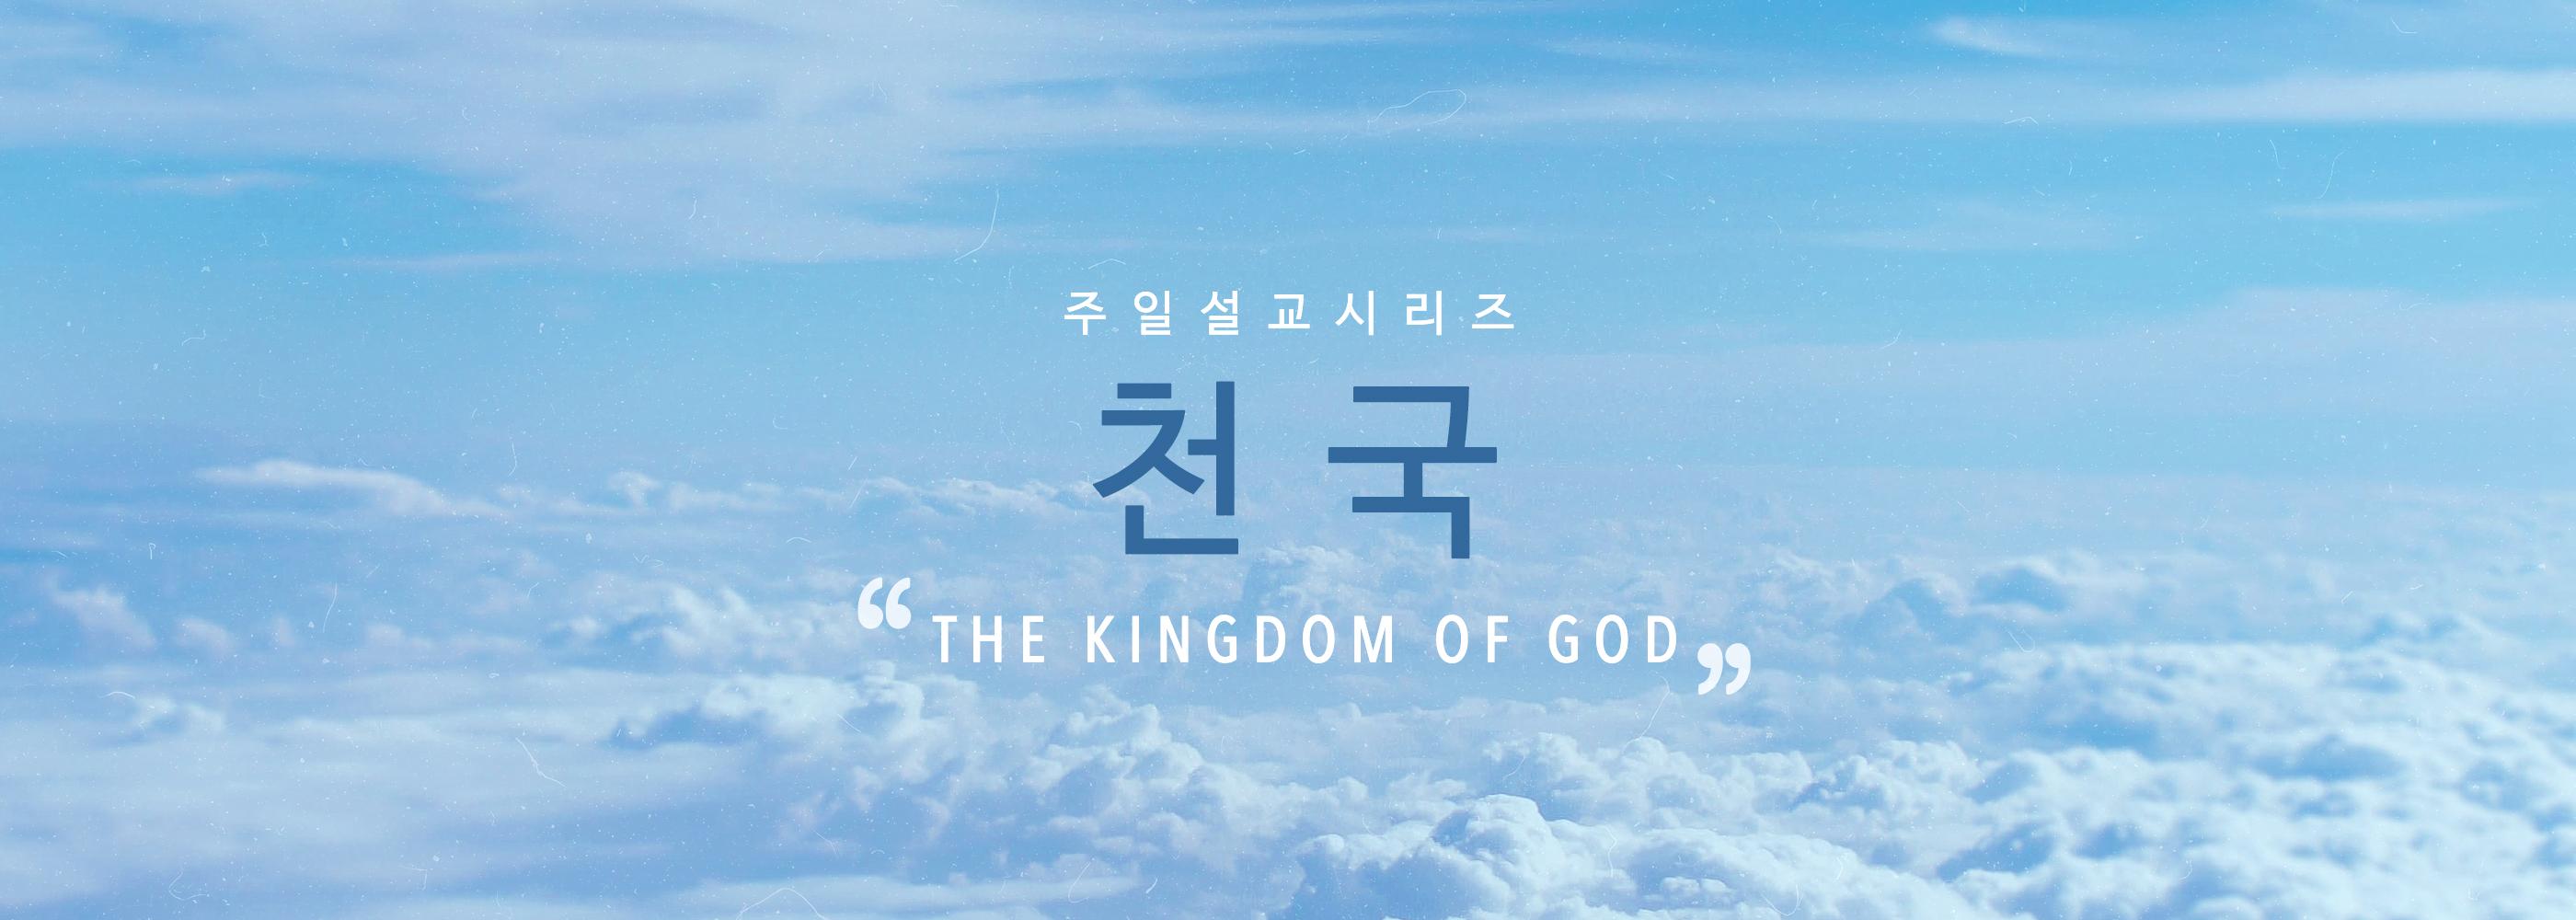 kingdomofgod (1)